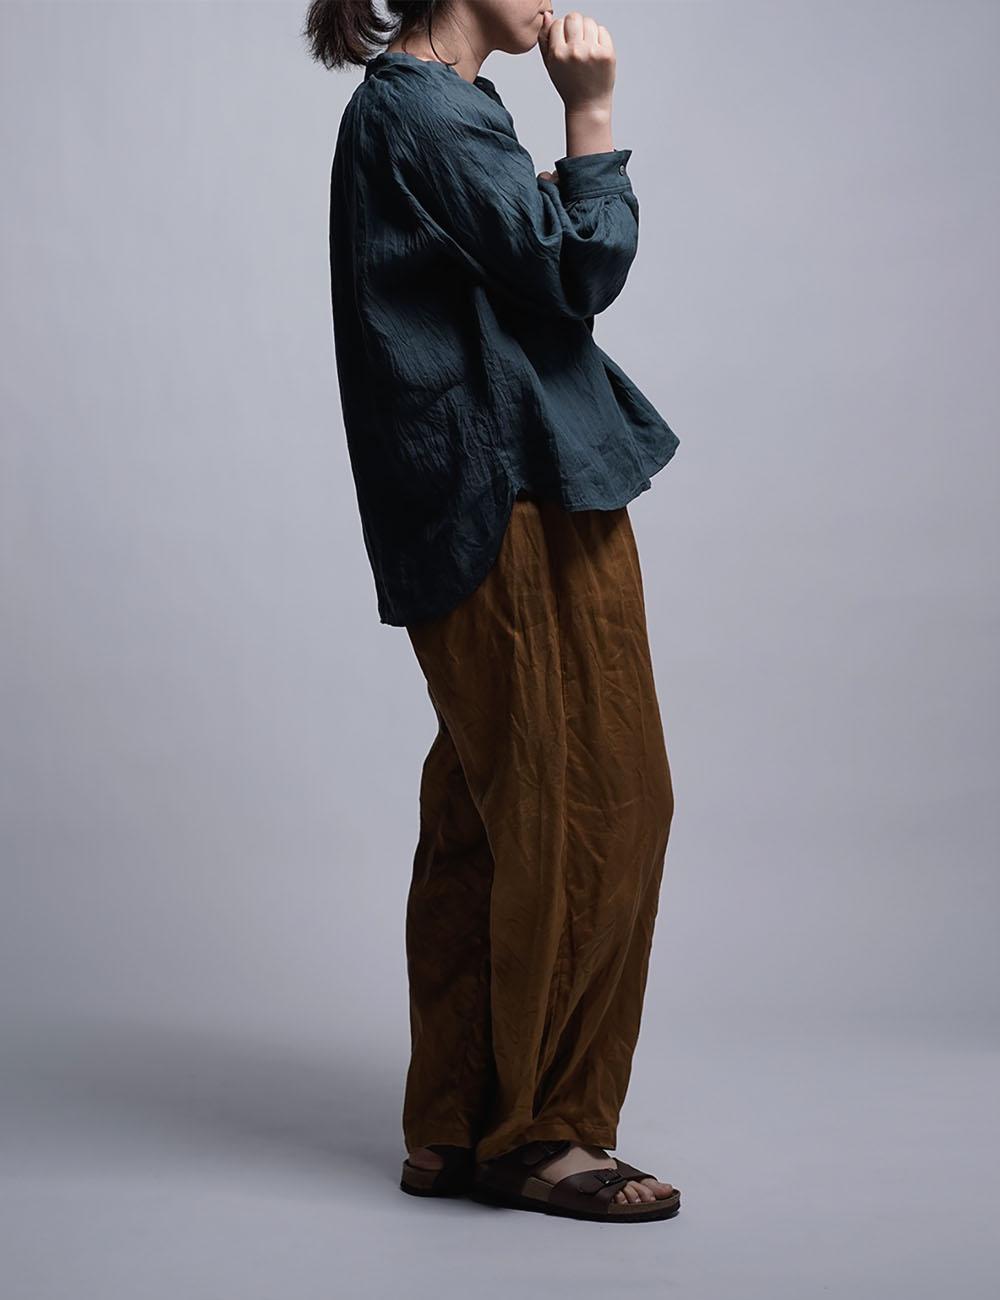 【wafu】 雅亜麻 linen shirt リネンシャツ 薄地 60番手 ハンドワッシャー / 金高麗納戸(こうらいなんど) t034a-kou1